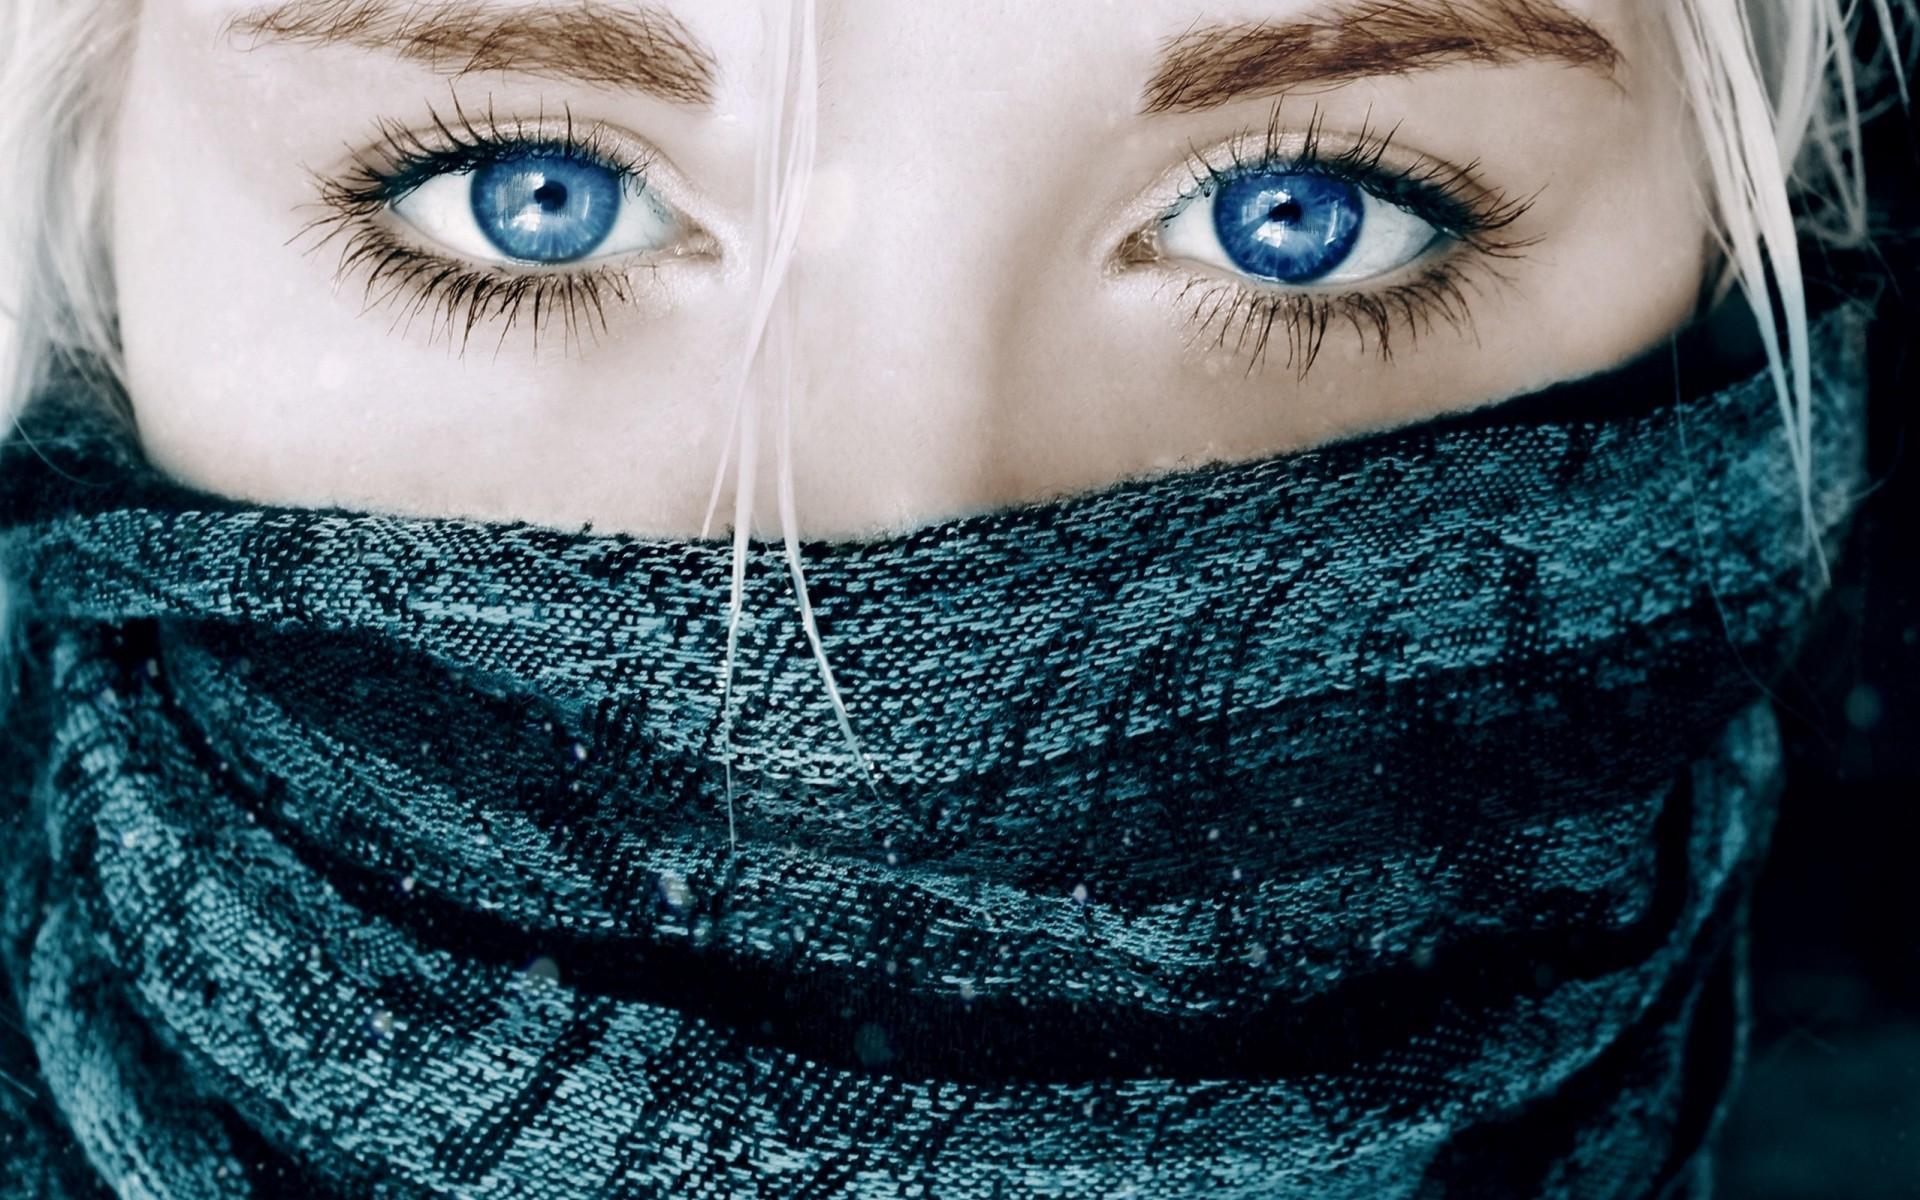 Blue Eye Wallpaper 75 images